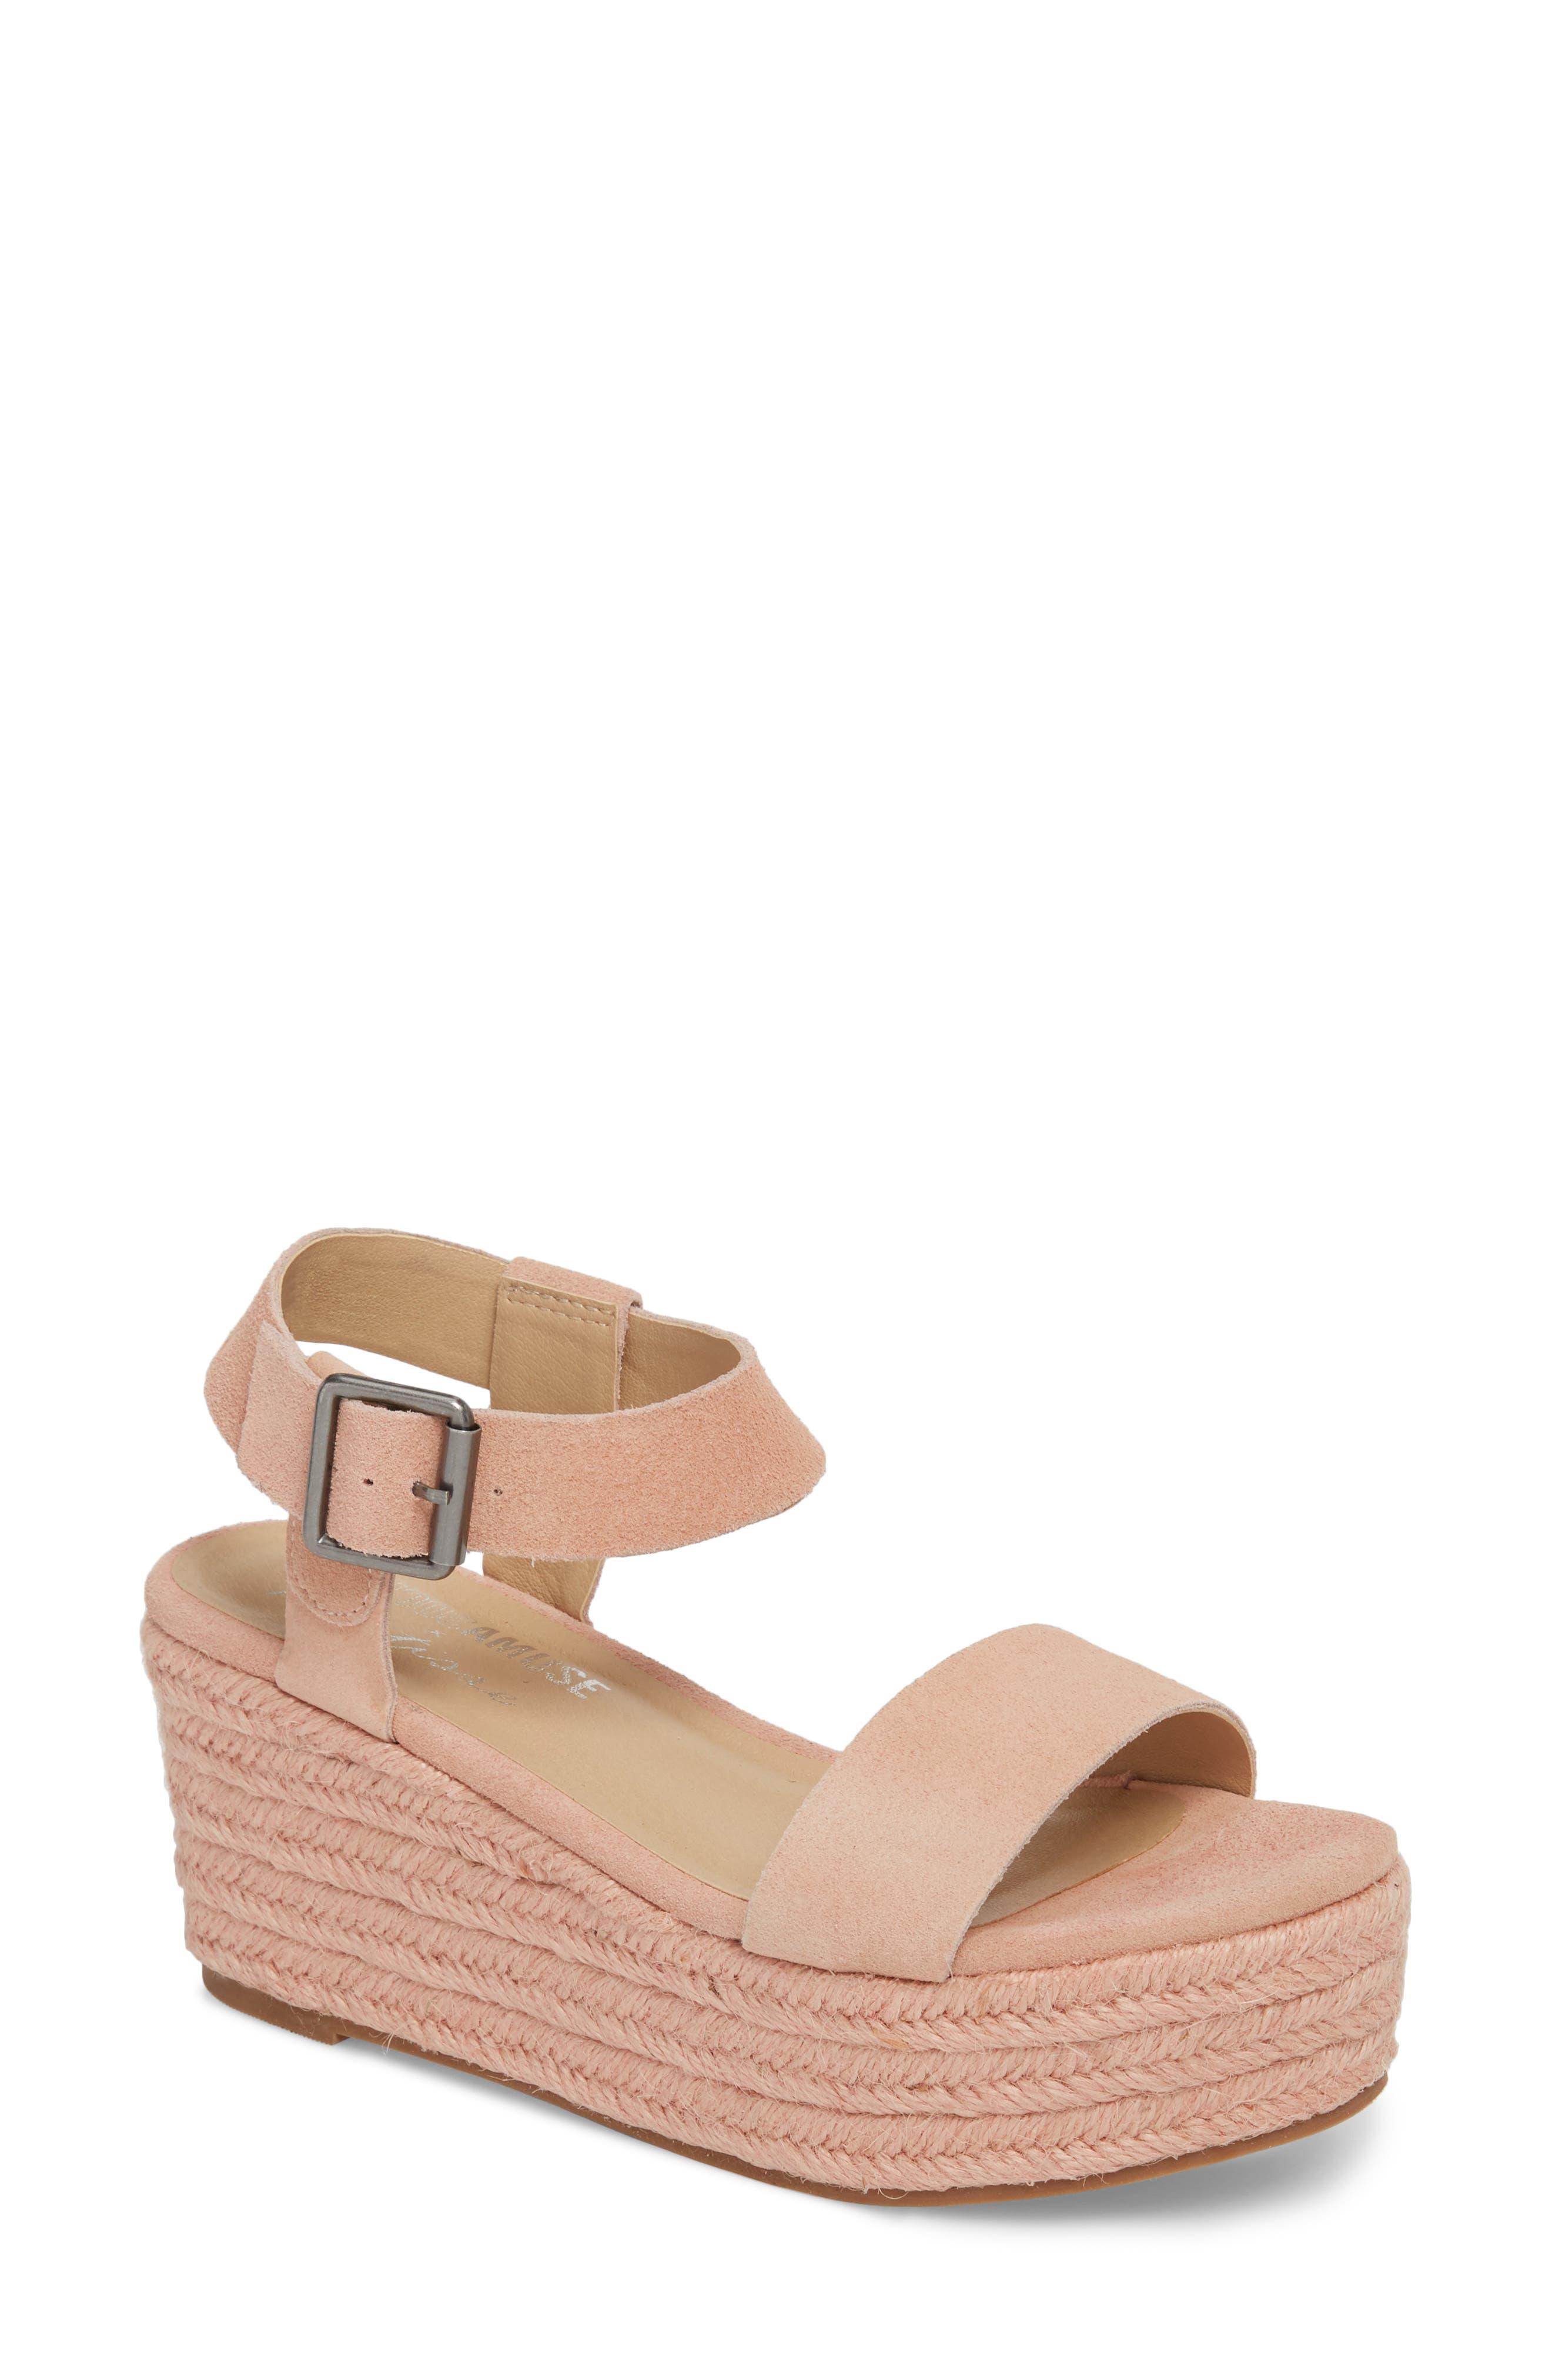 Amuse Society x Matisse Siena Wedge Sandal,                             Main thumbnail 3, color,